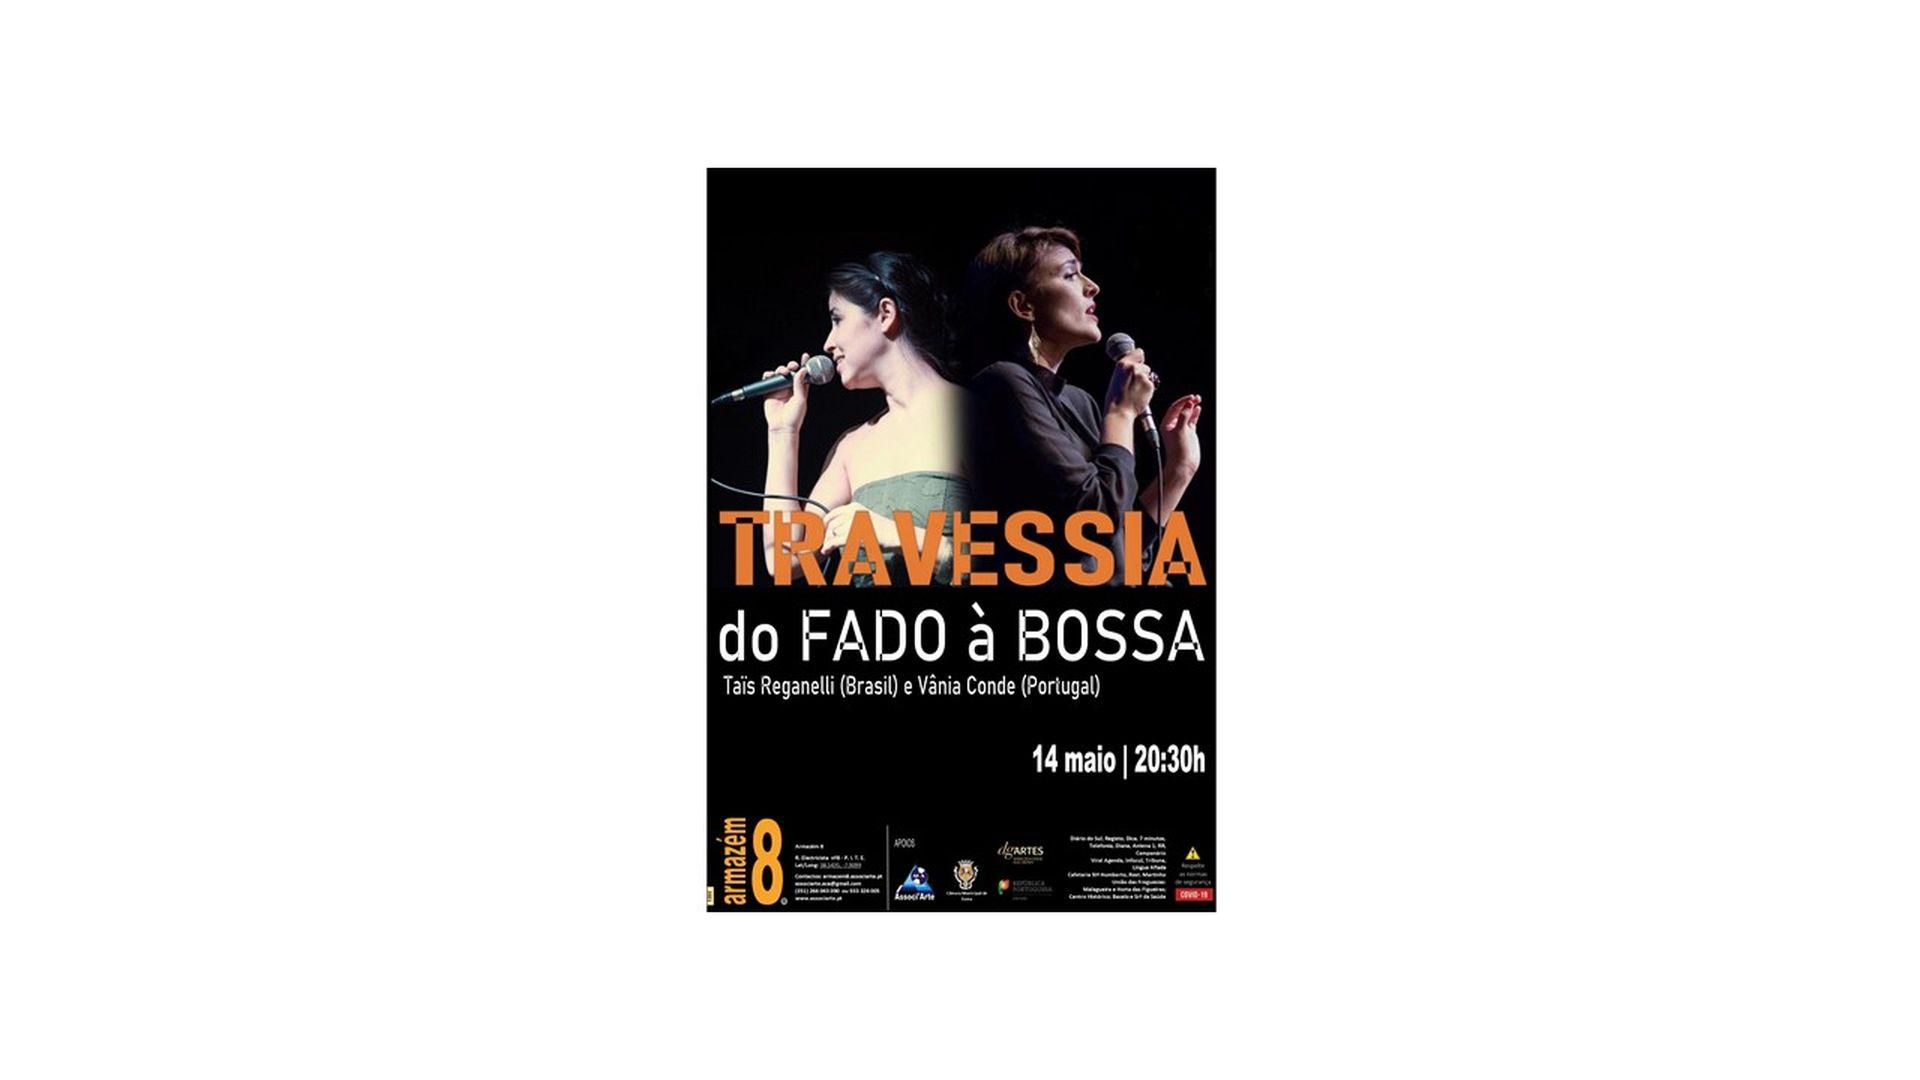 Travessia8211DaBossaAoFado_1620646033